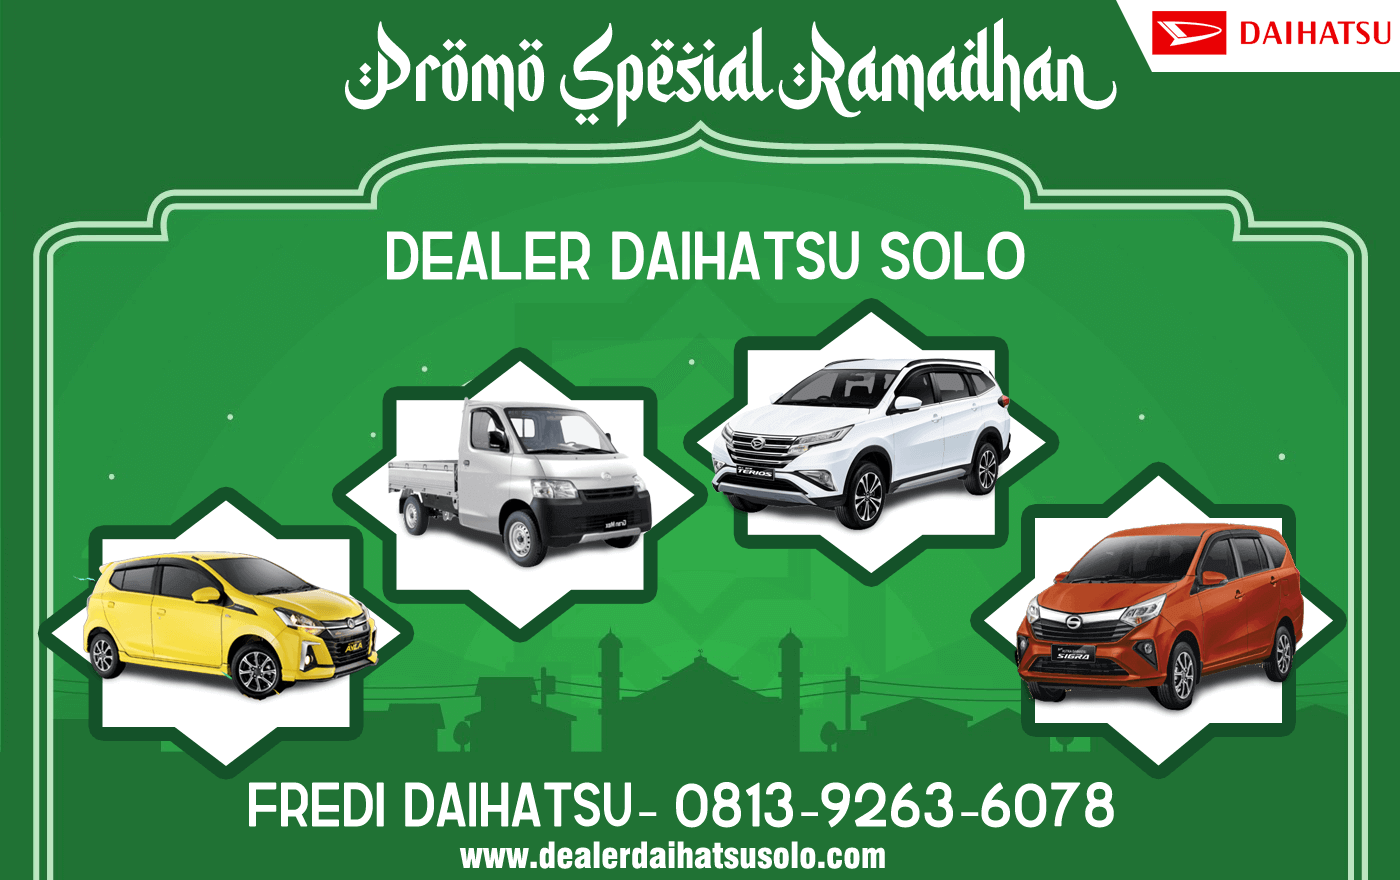 Promo Ramadhan Dealer Daihatsu Solo